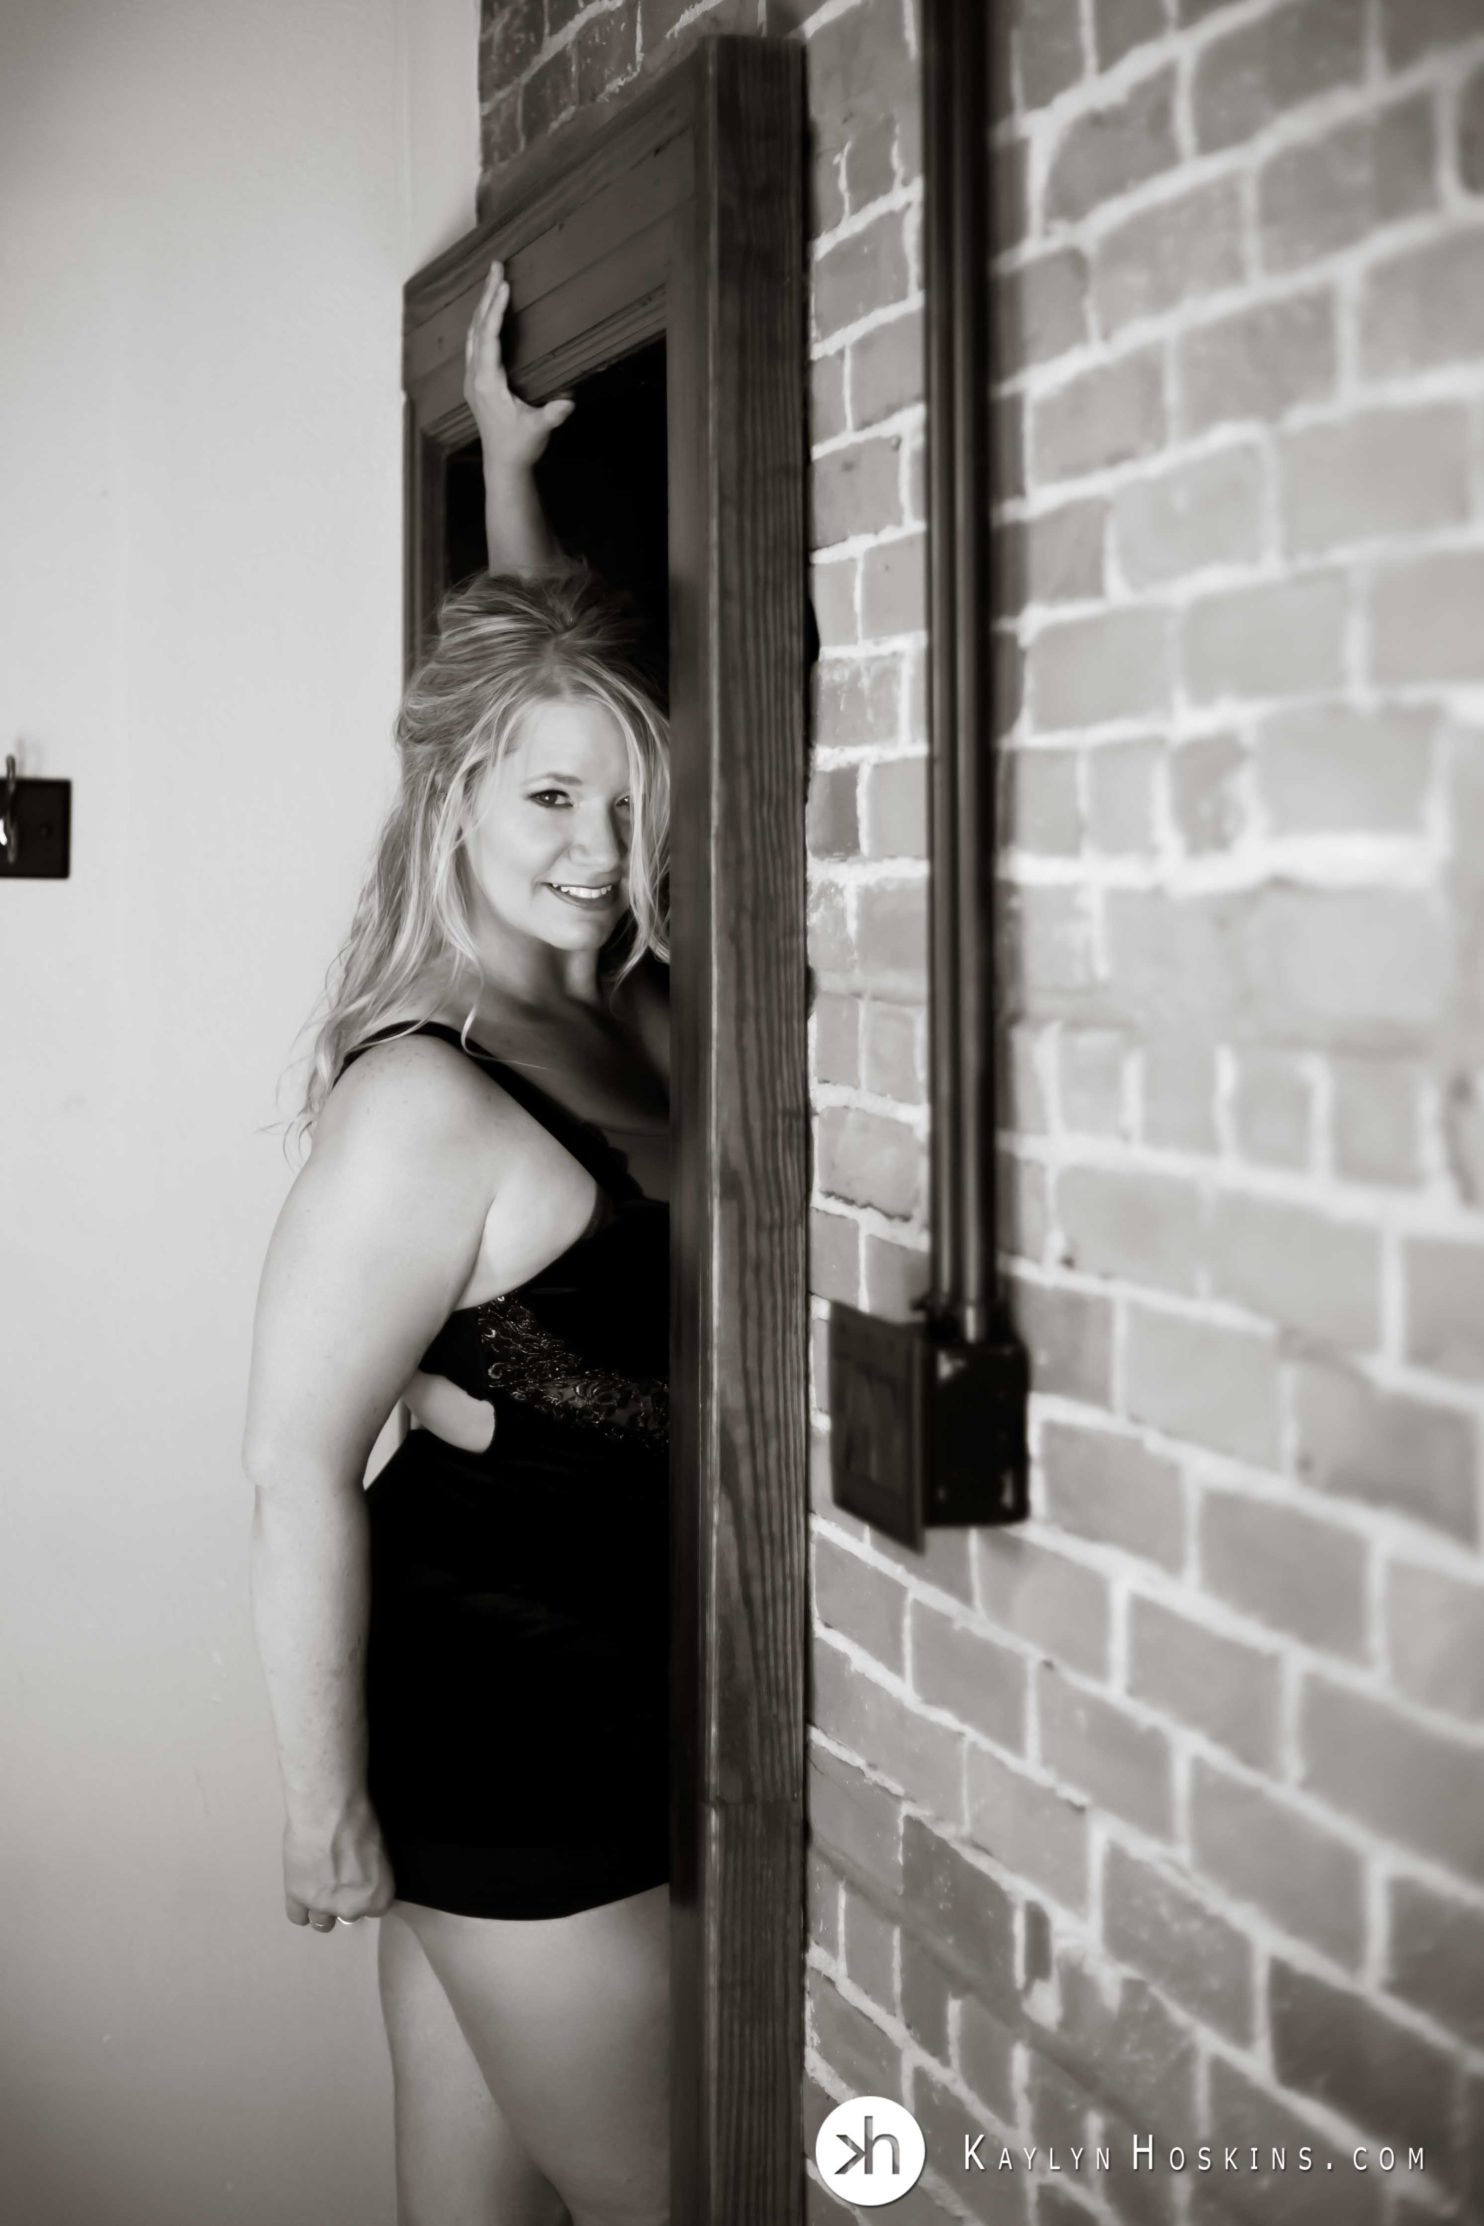 Gorgeous Blonde standing in old wooden doorway wearing black lingerie during boudoir photo shoot